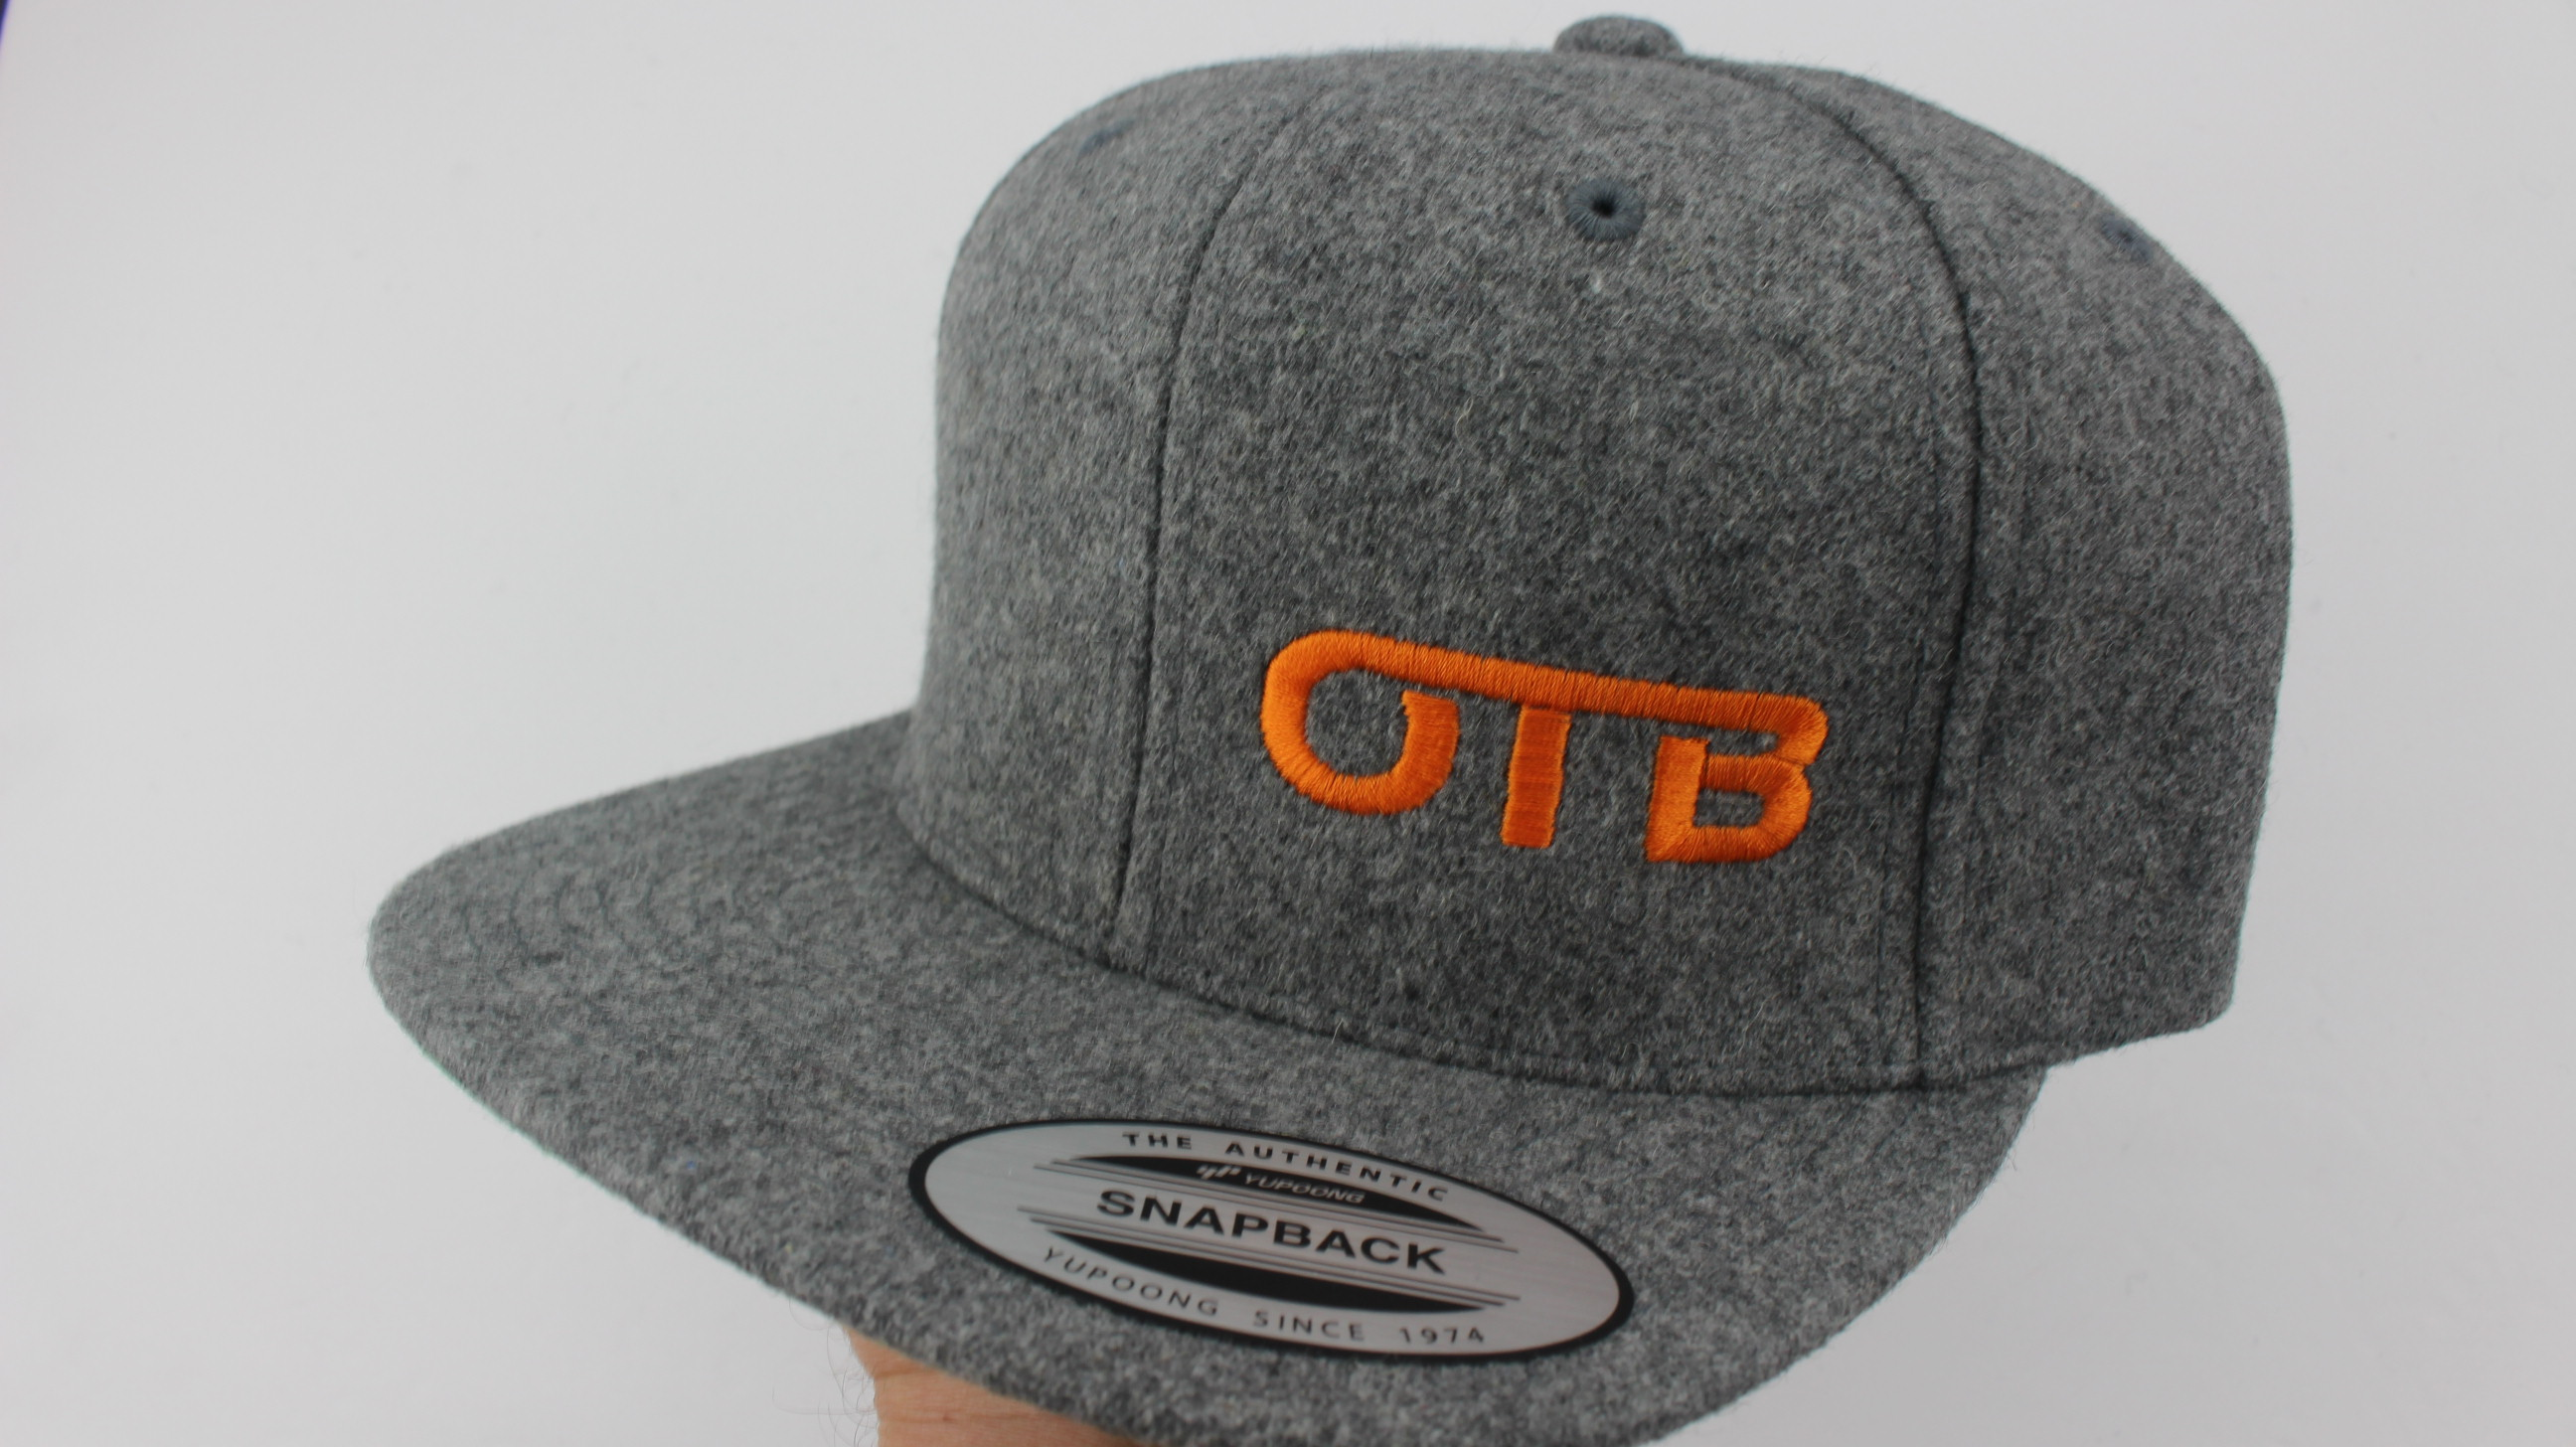 c42131210f4 Flatbill Snapback Hat - heather-wool - 1264 - orange